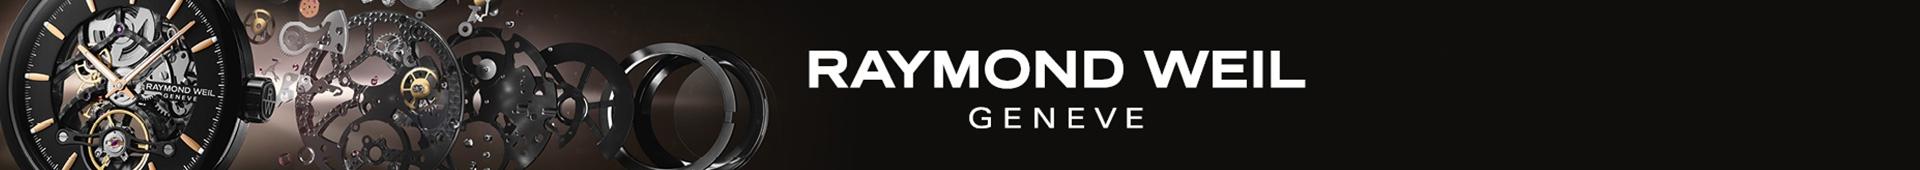 Raymond Weil Noemia